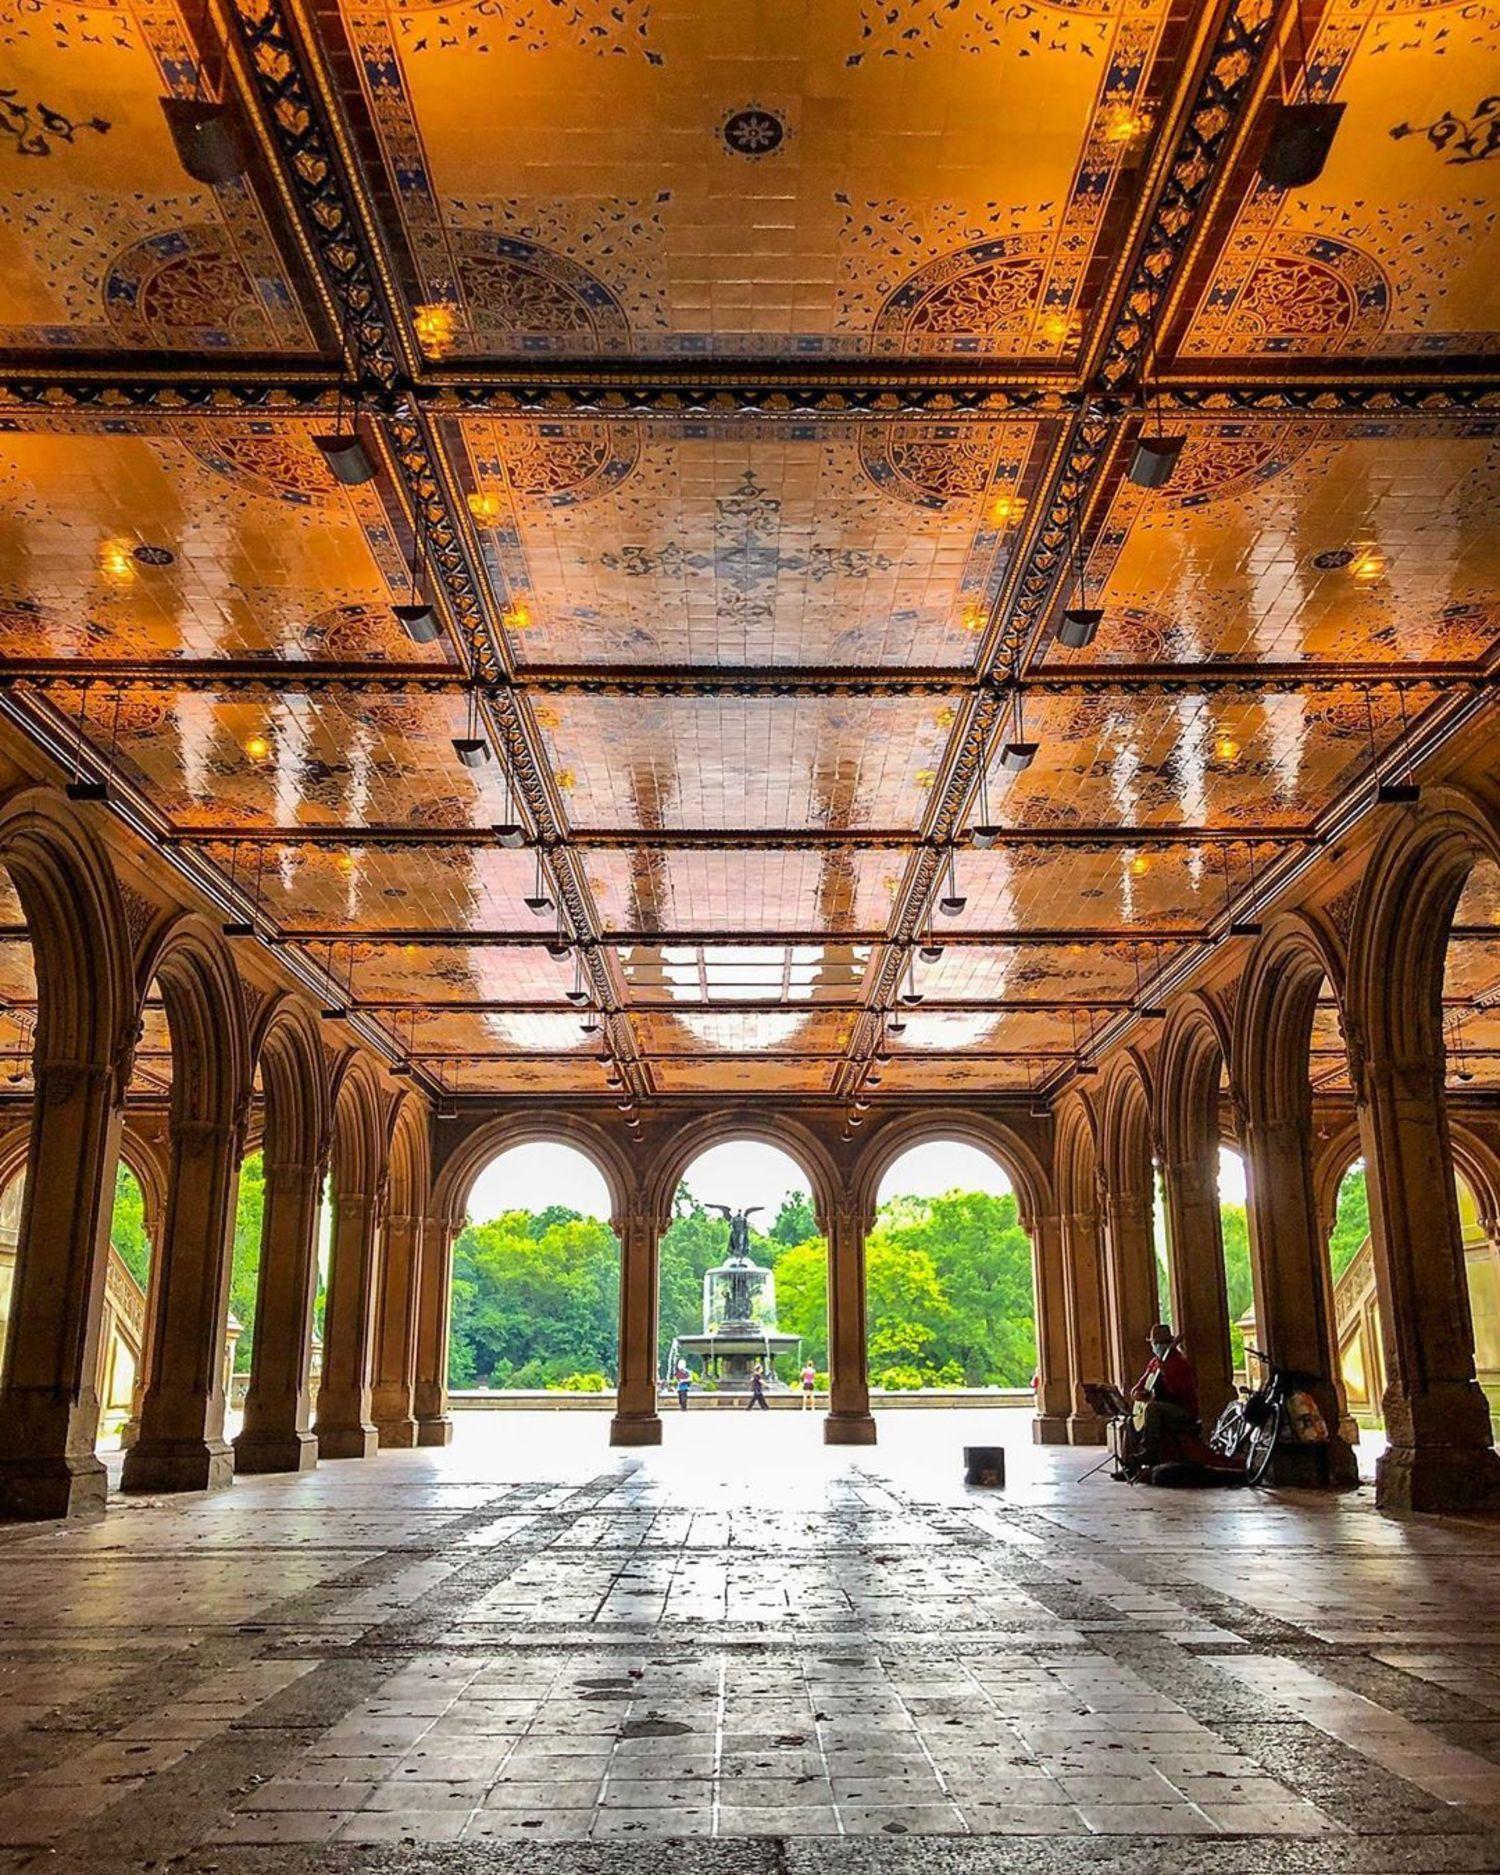 Bethesda Terrace and Fountain, Central Park, Manhattan